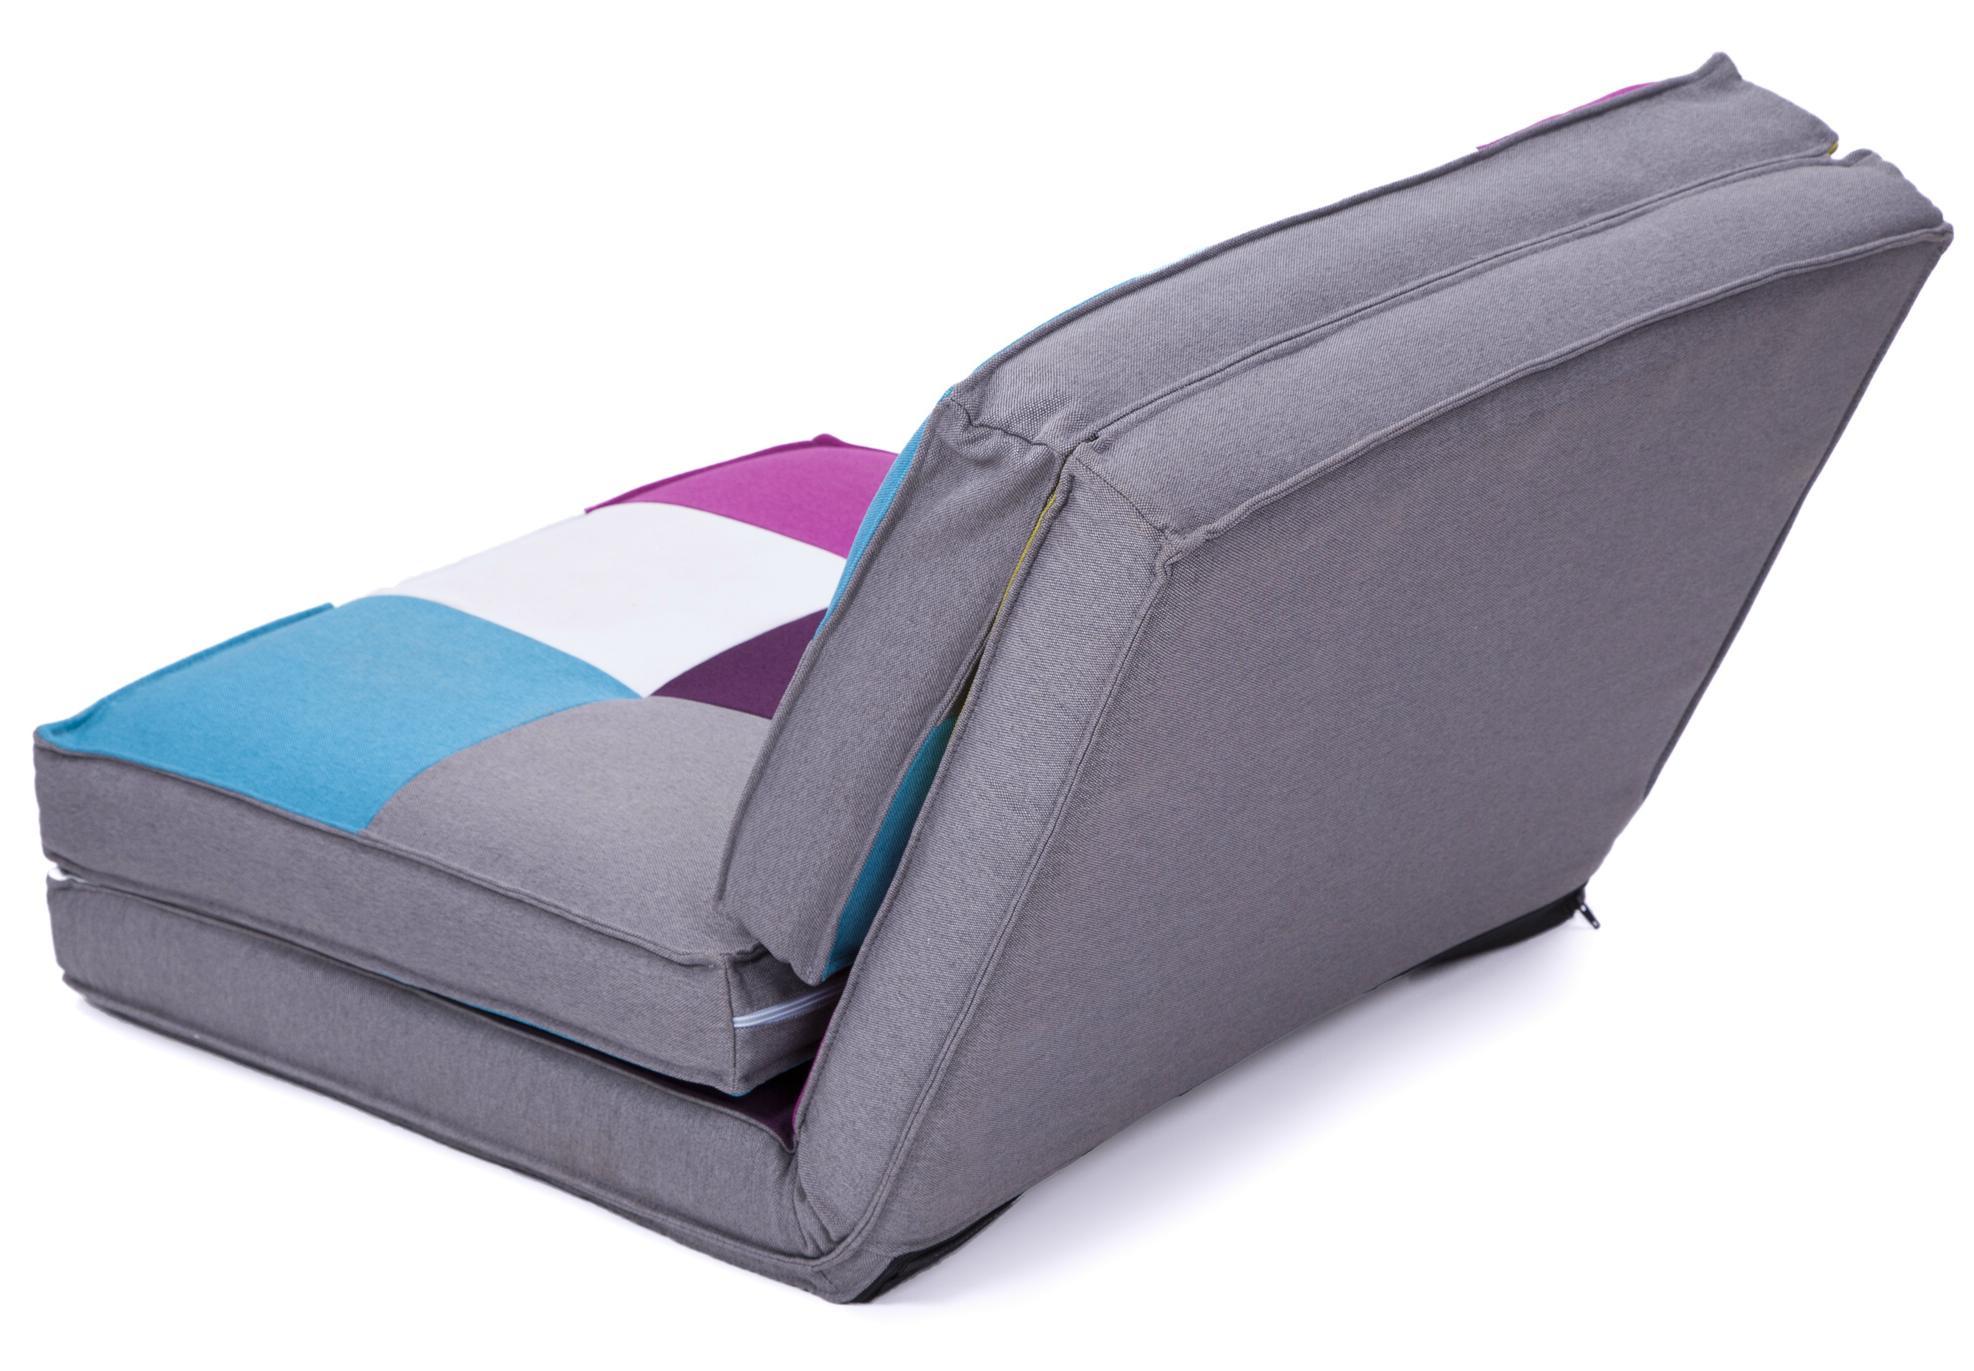 Como hacer una cama plegable sharemedoc for Sofa cama plegable